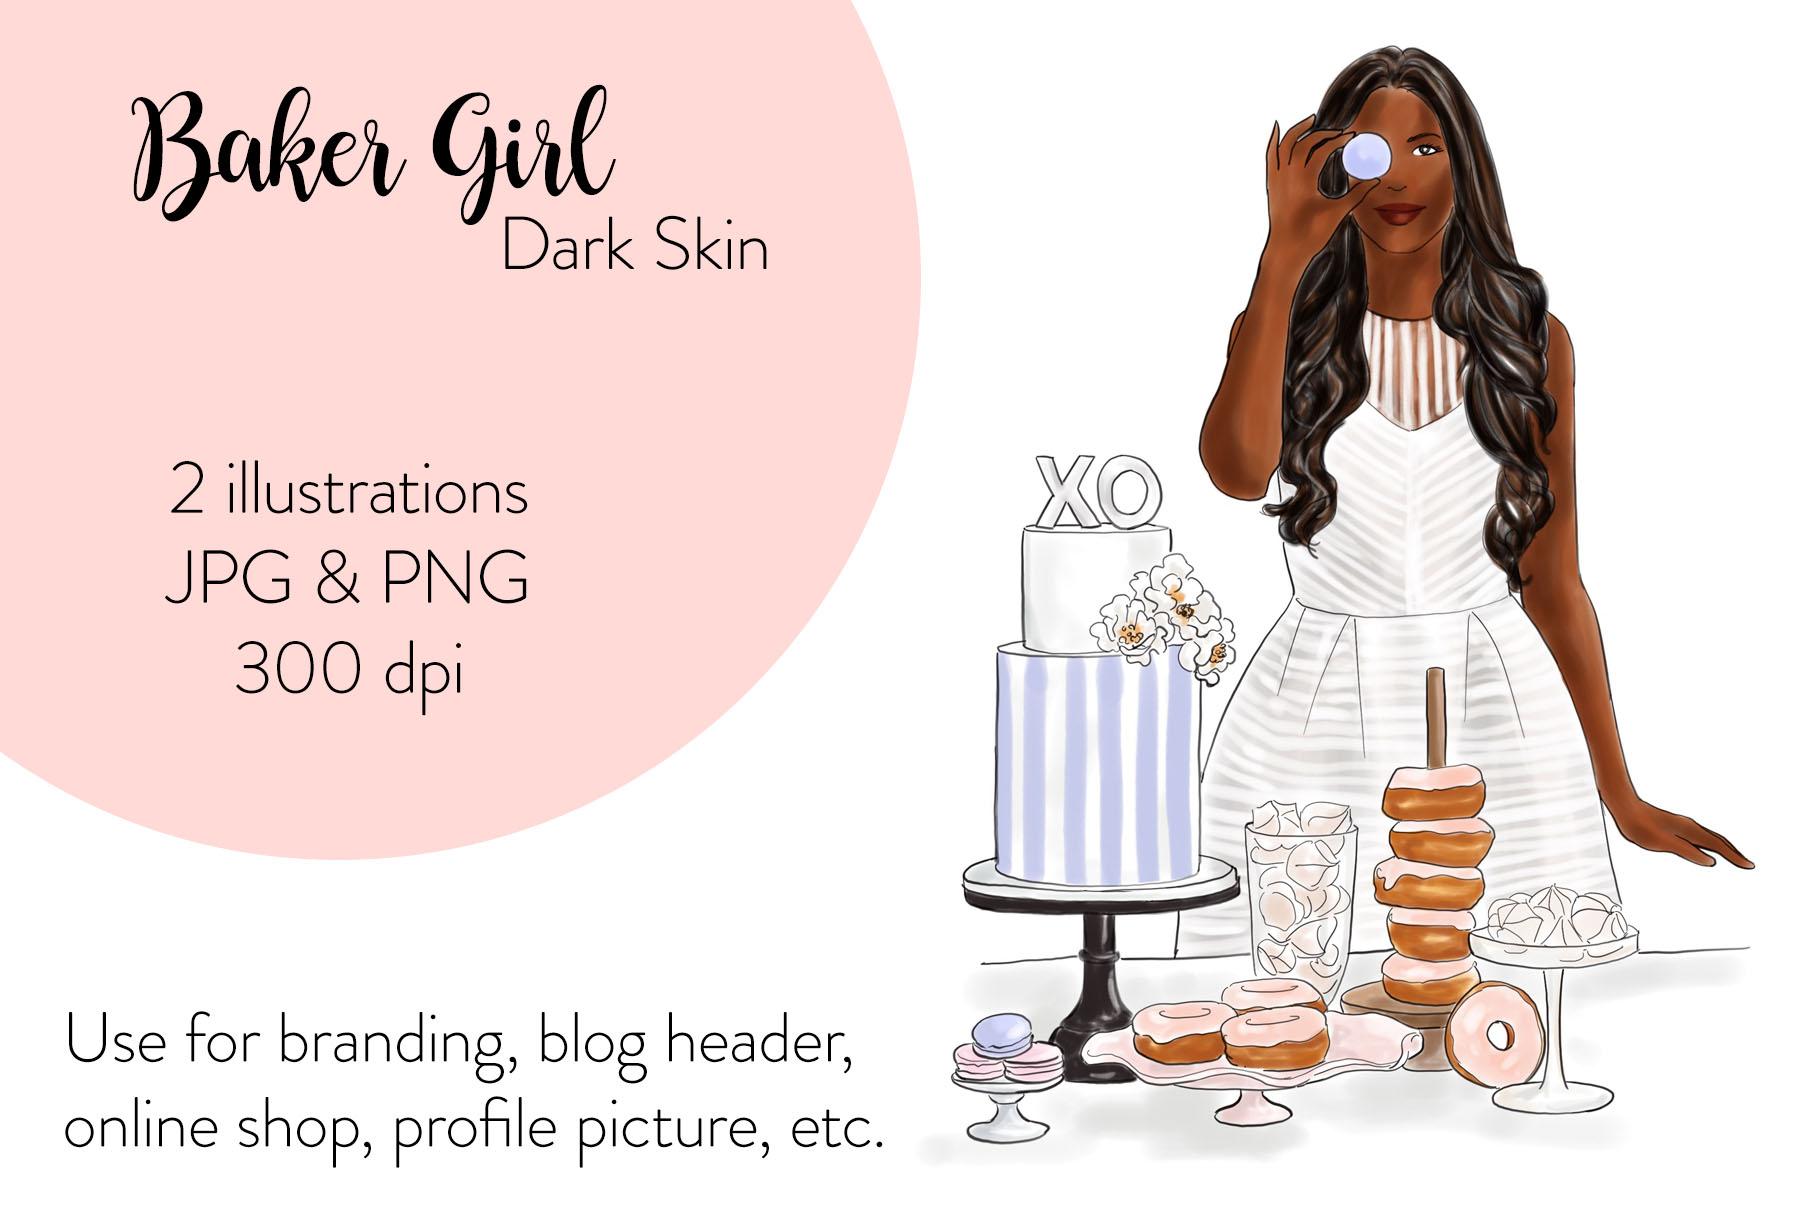 Fashion illustration - Baker Girl - Dark Skin example image 1